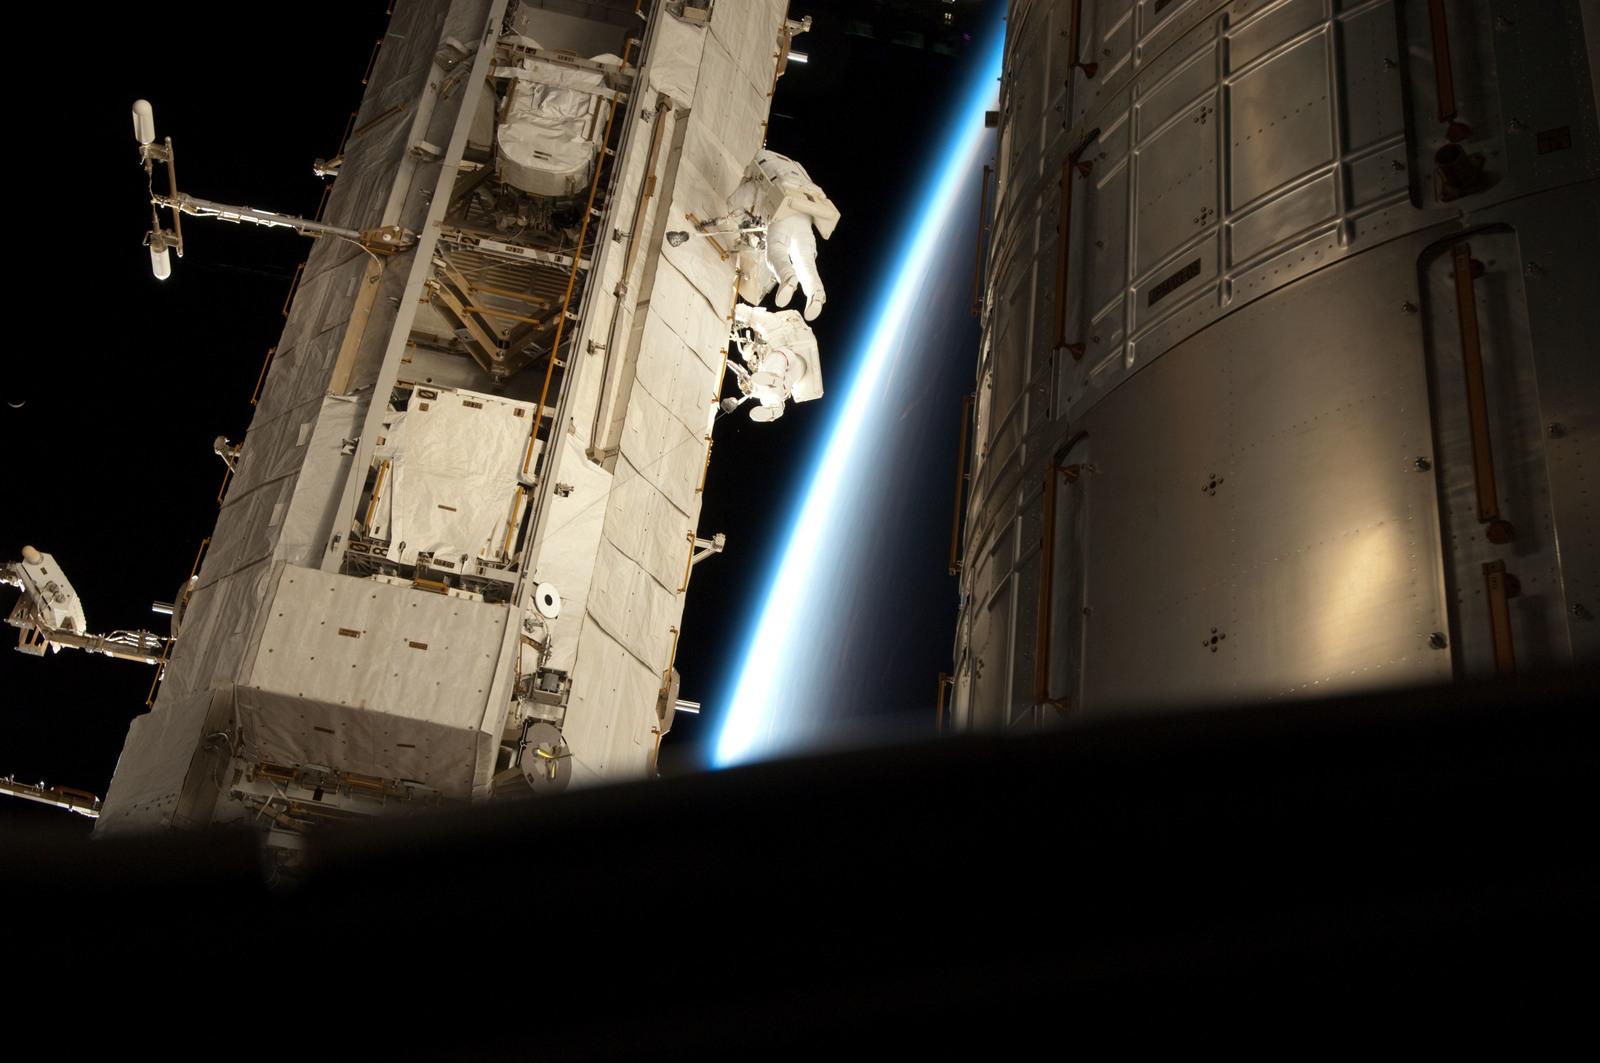 S131E008976 - STS-131 - STS-131 EVA 2 P1 Radiator Grapple Fixture Stowage Beam Installation